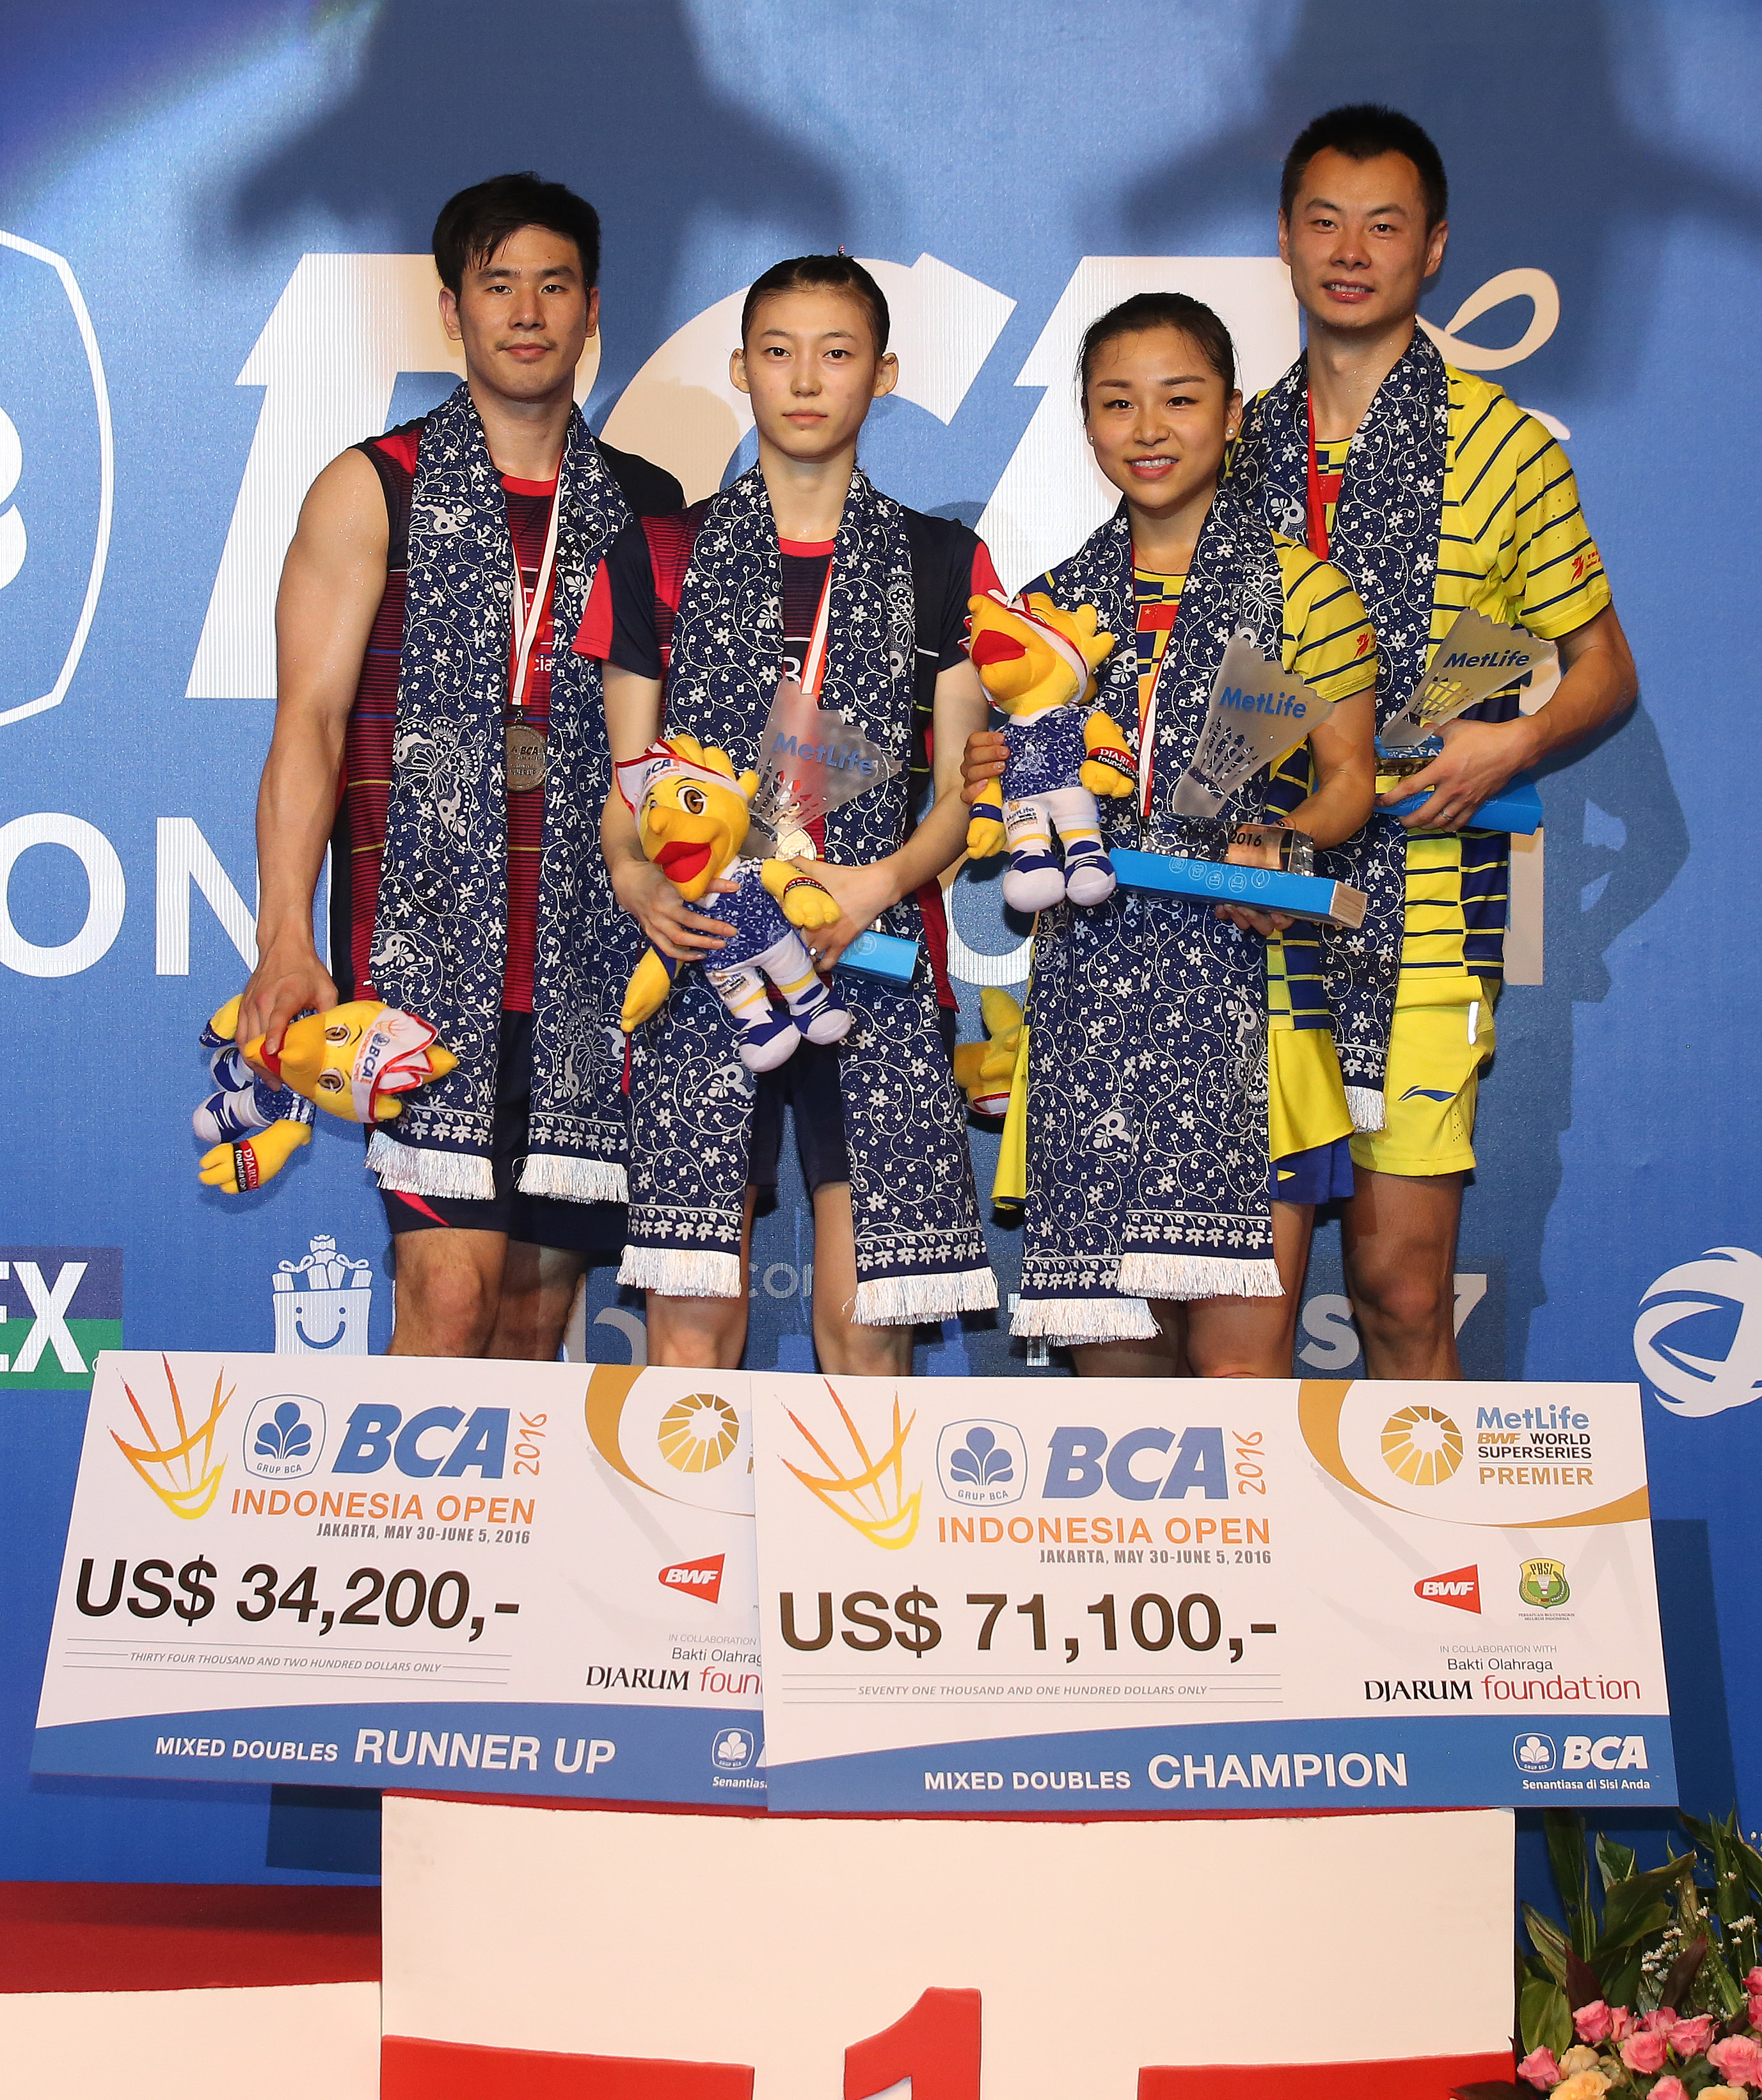 Indonesia Open 2016